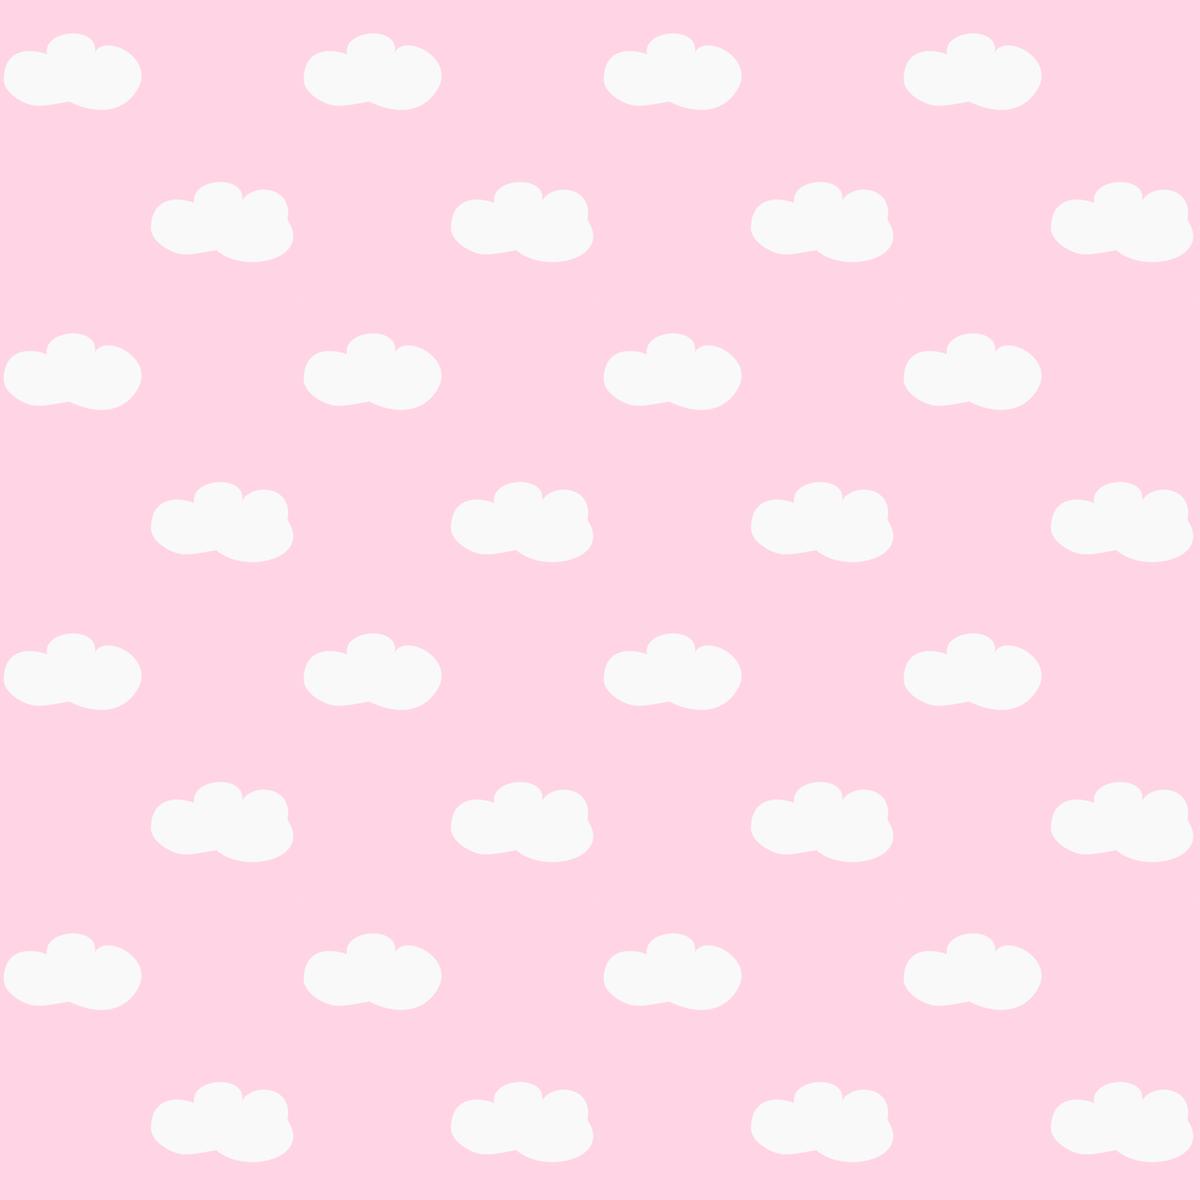 Scrapbook paper clouds - Free Digital Fluffy Clouds Scrapbooking Papers Ausdruckbare Geschenkpapiere Freebie